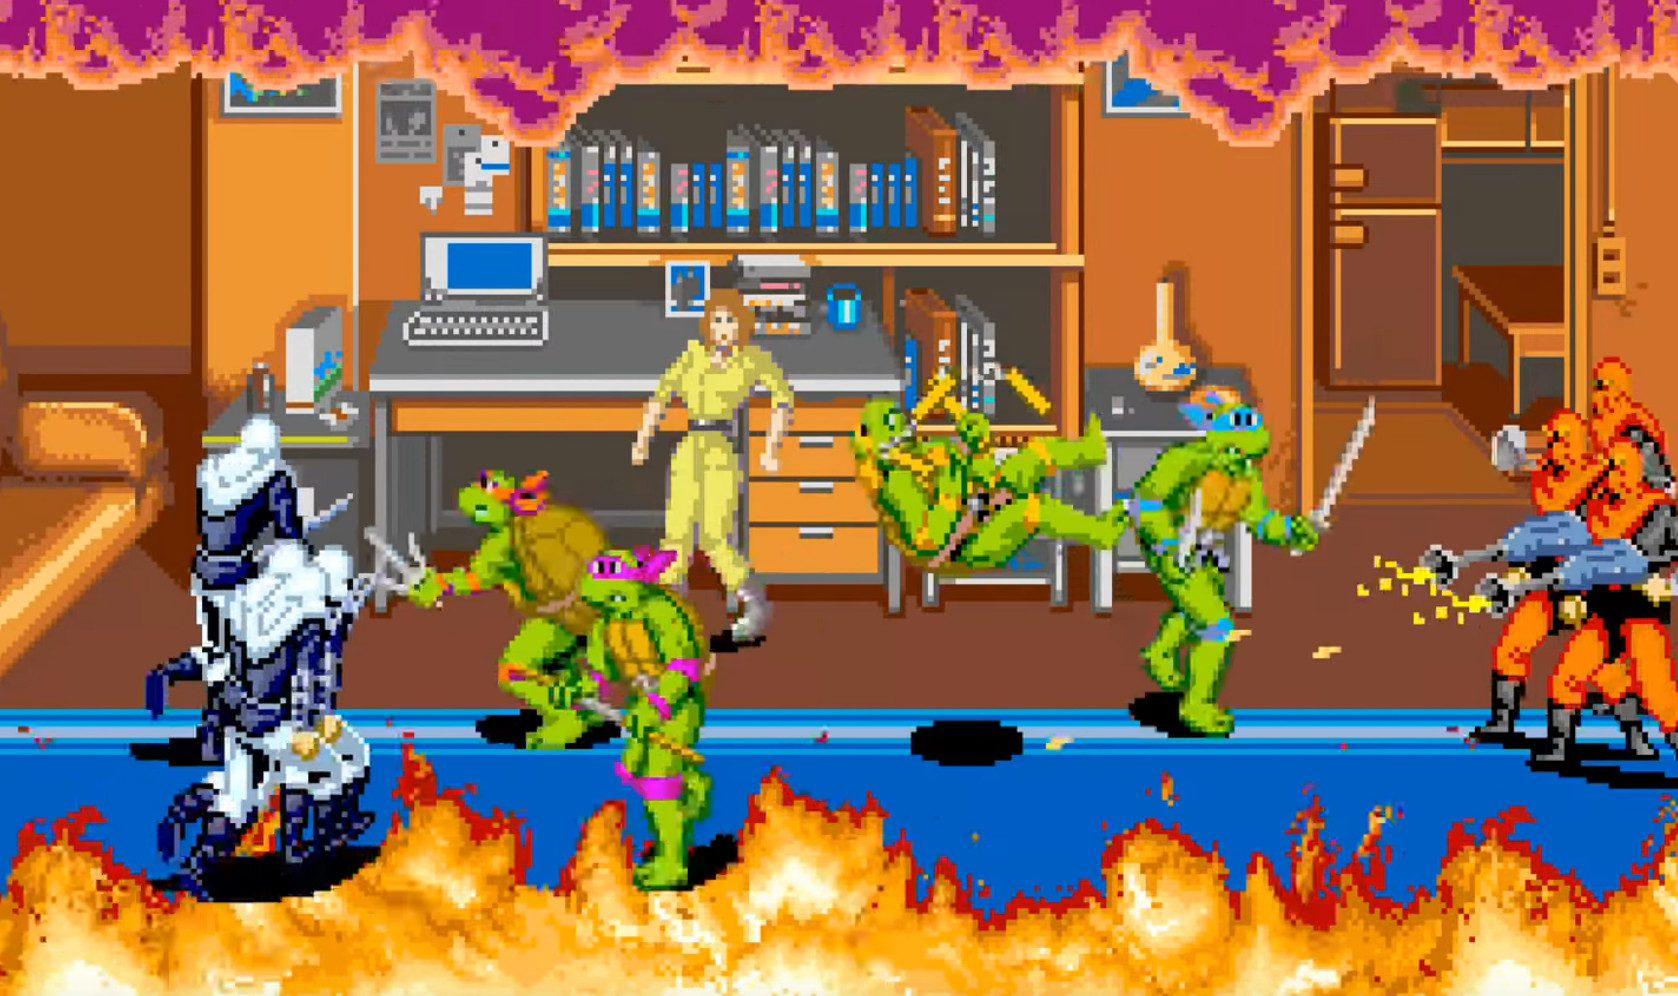 Teenage mutant ninja turtles - arcade - generacion xbox